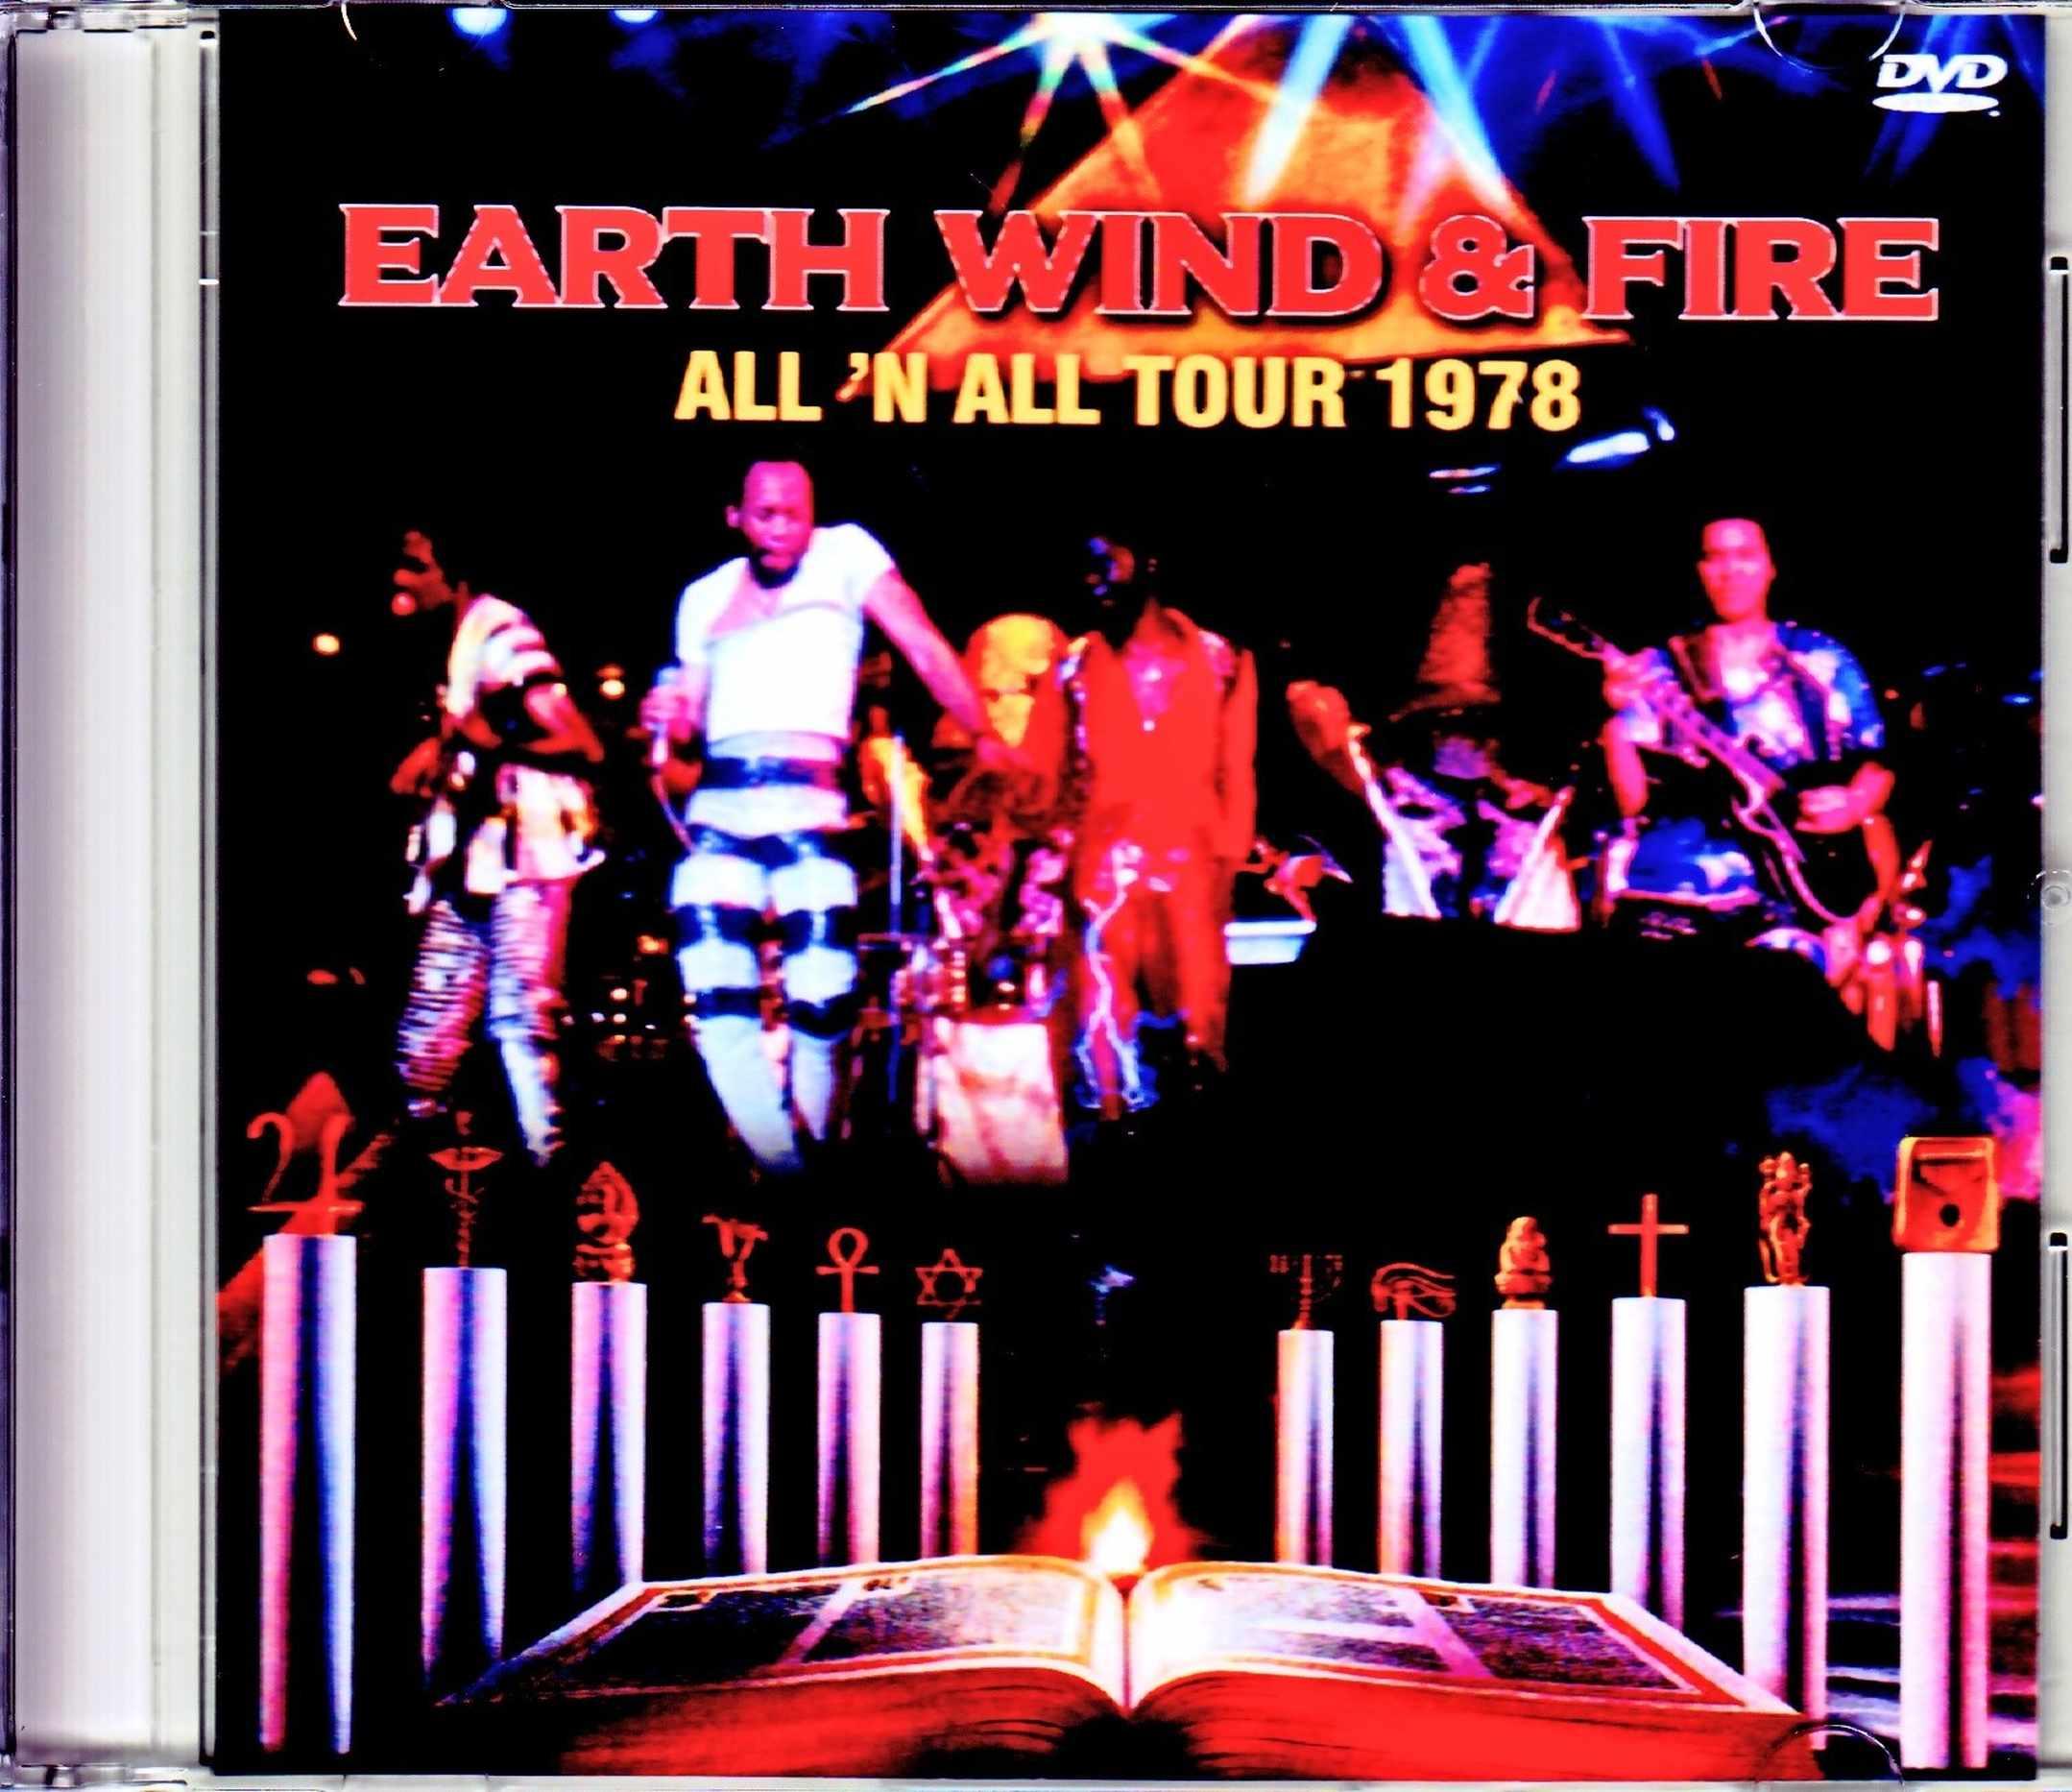 EW & F Earth Wind & Fire アース・ウィンド・アンド・ファイヤー/太陽神 ツアー 1978年 All 'N All Tour 1978